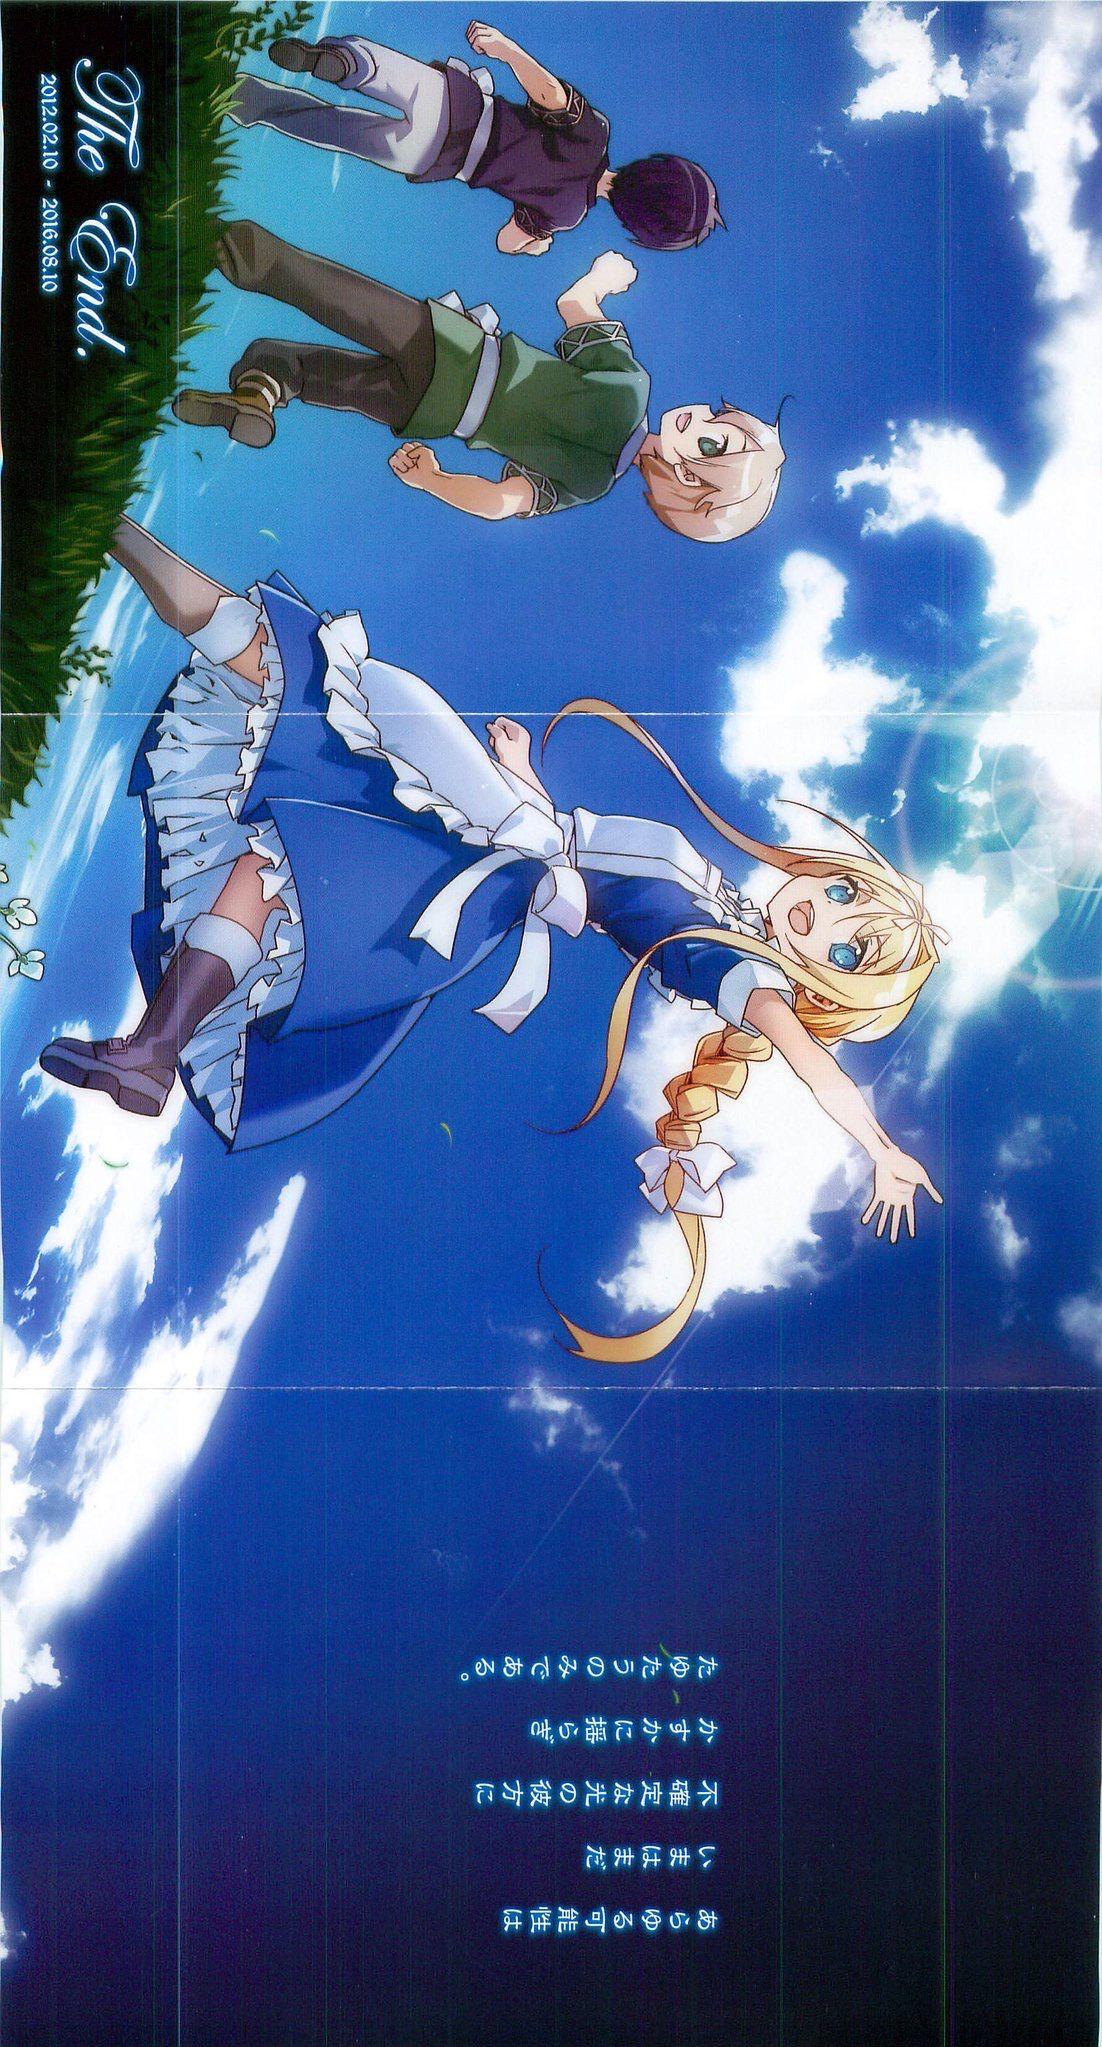 HD限定 Sword Art Online 刀劍神域 18 Alicization Lasting - サンゴメガ